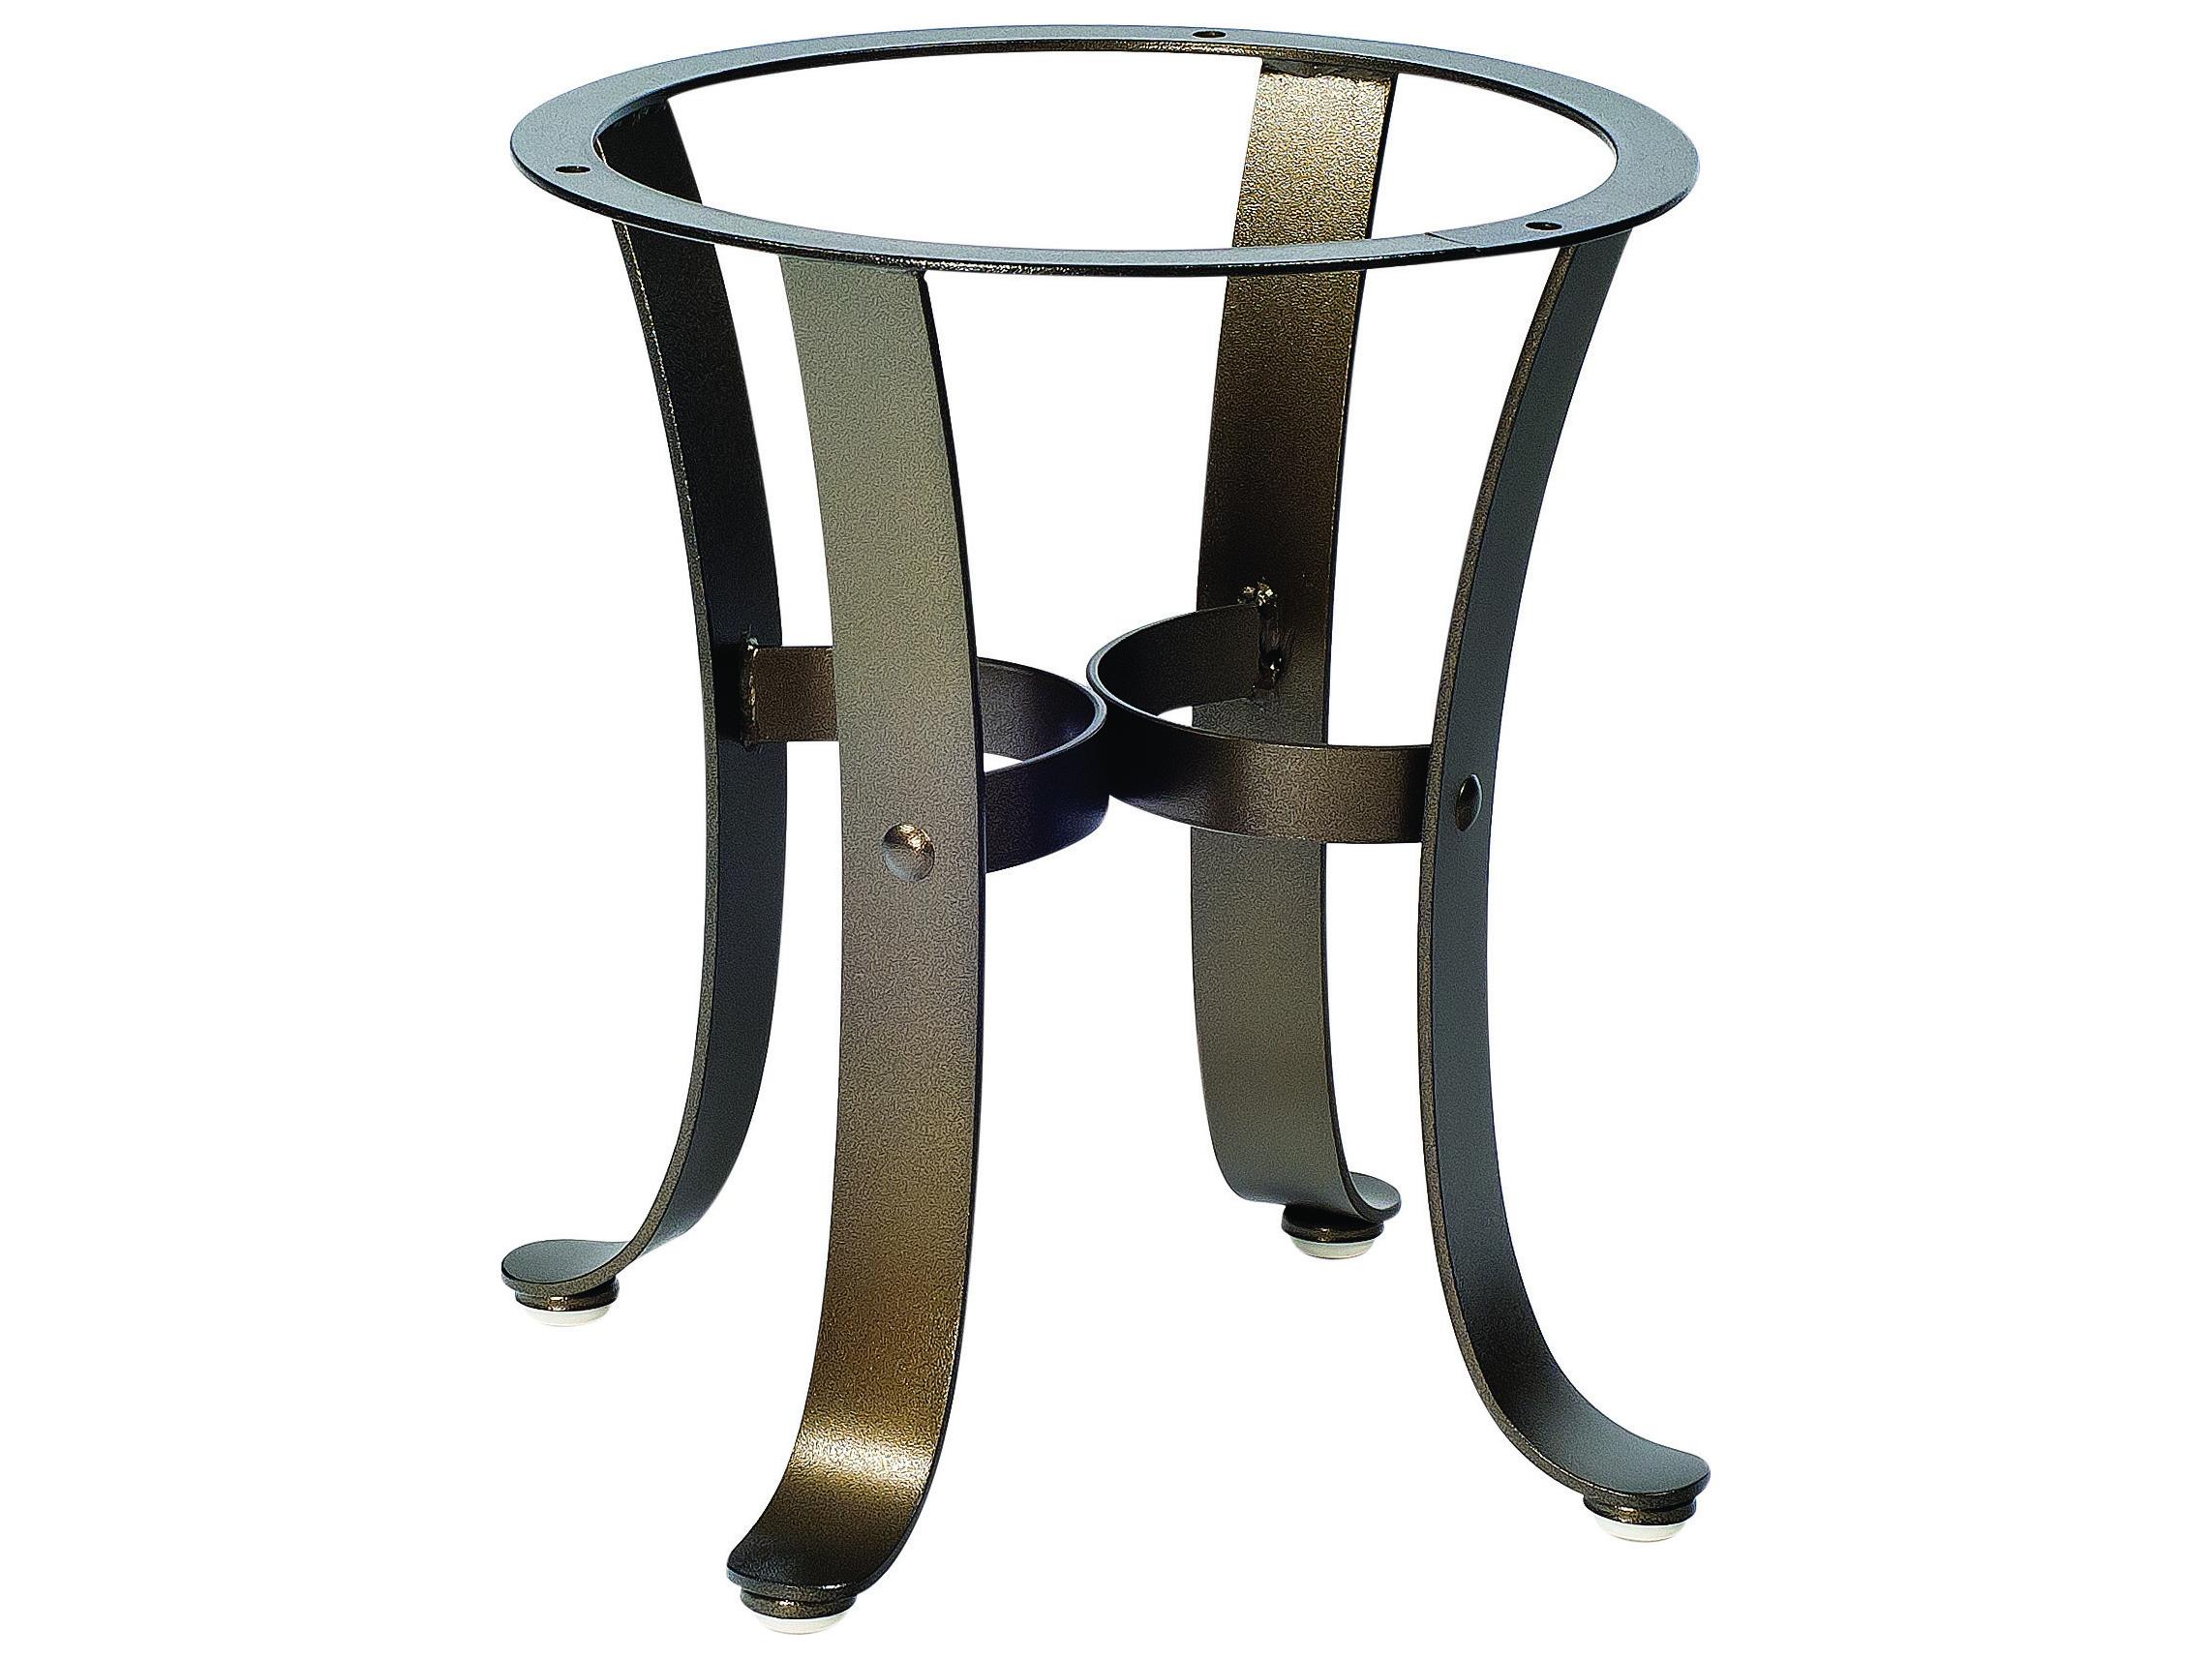 Woodard Cascade Wrought Iron End Table Base 2w3900